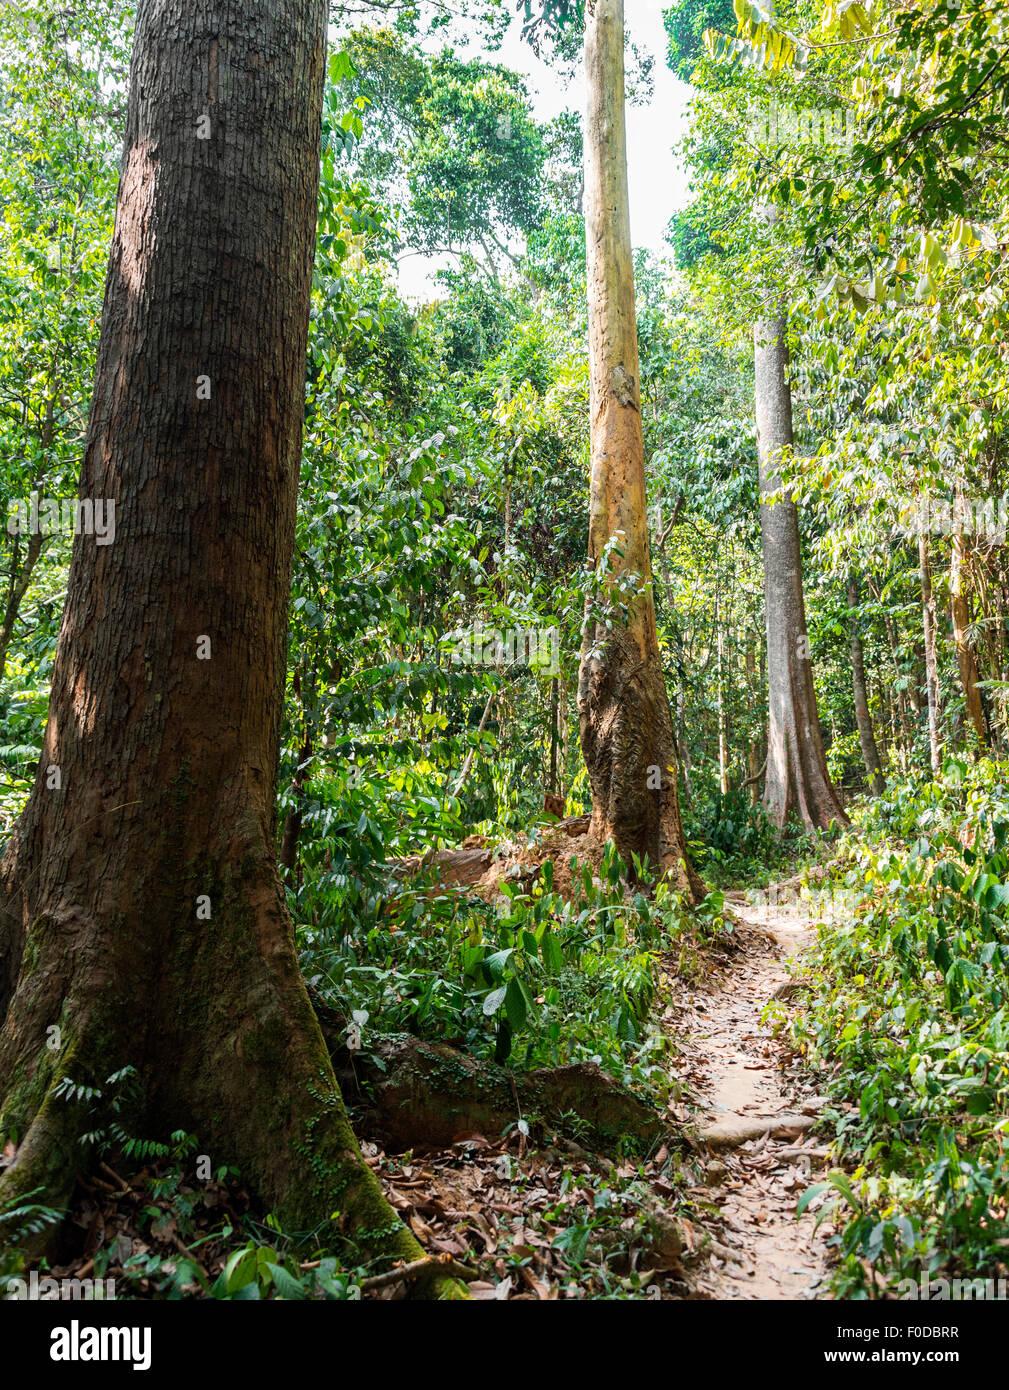 Senderos en la selva, Kuala Tahan, Taman Negara, Malasia Imagen De Stock